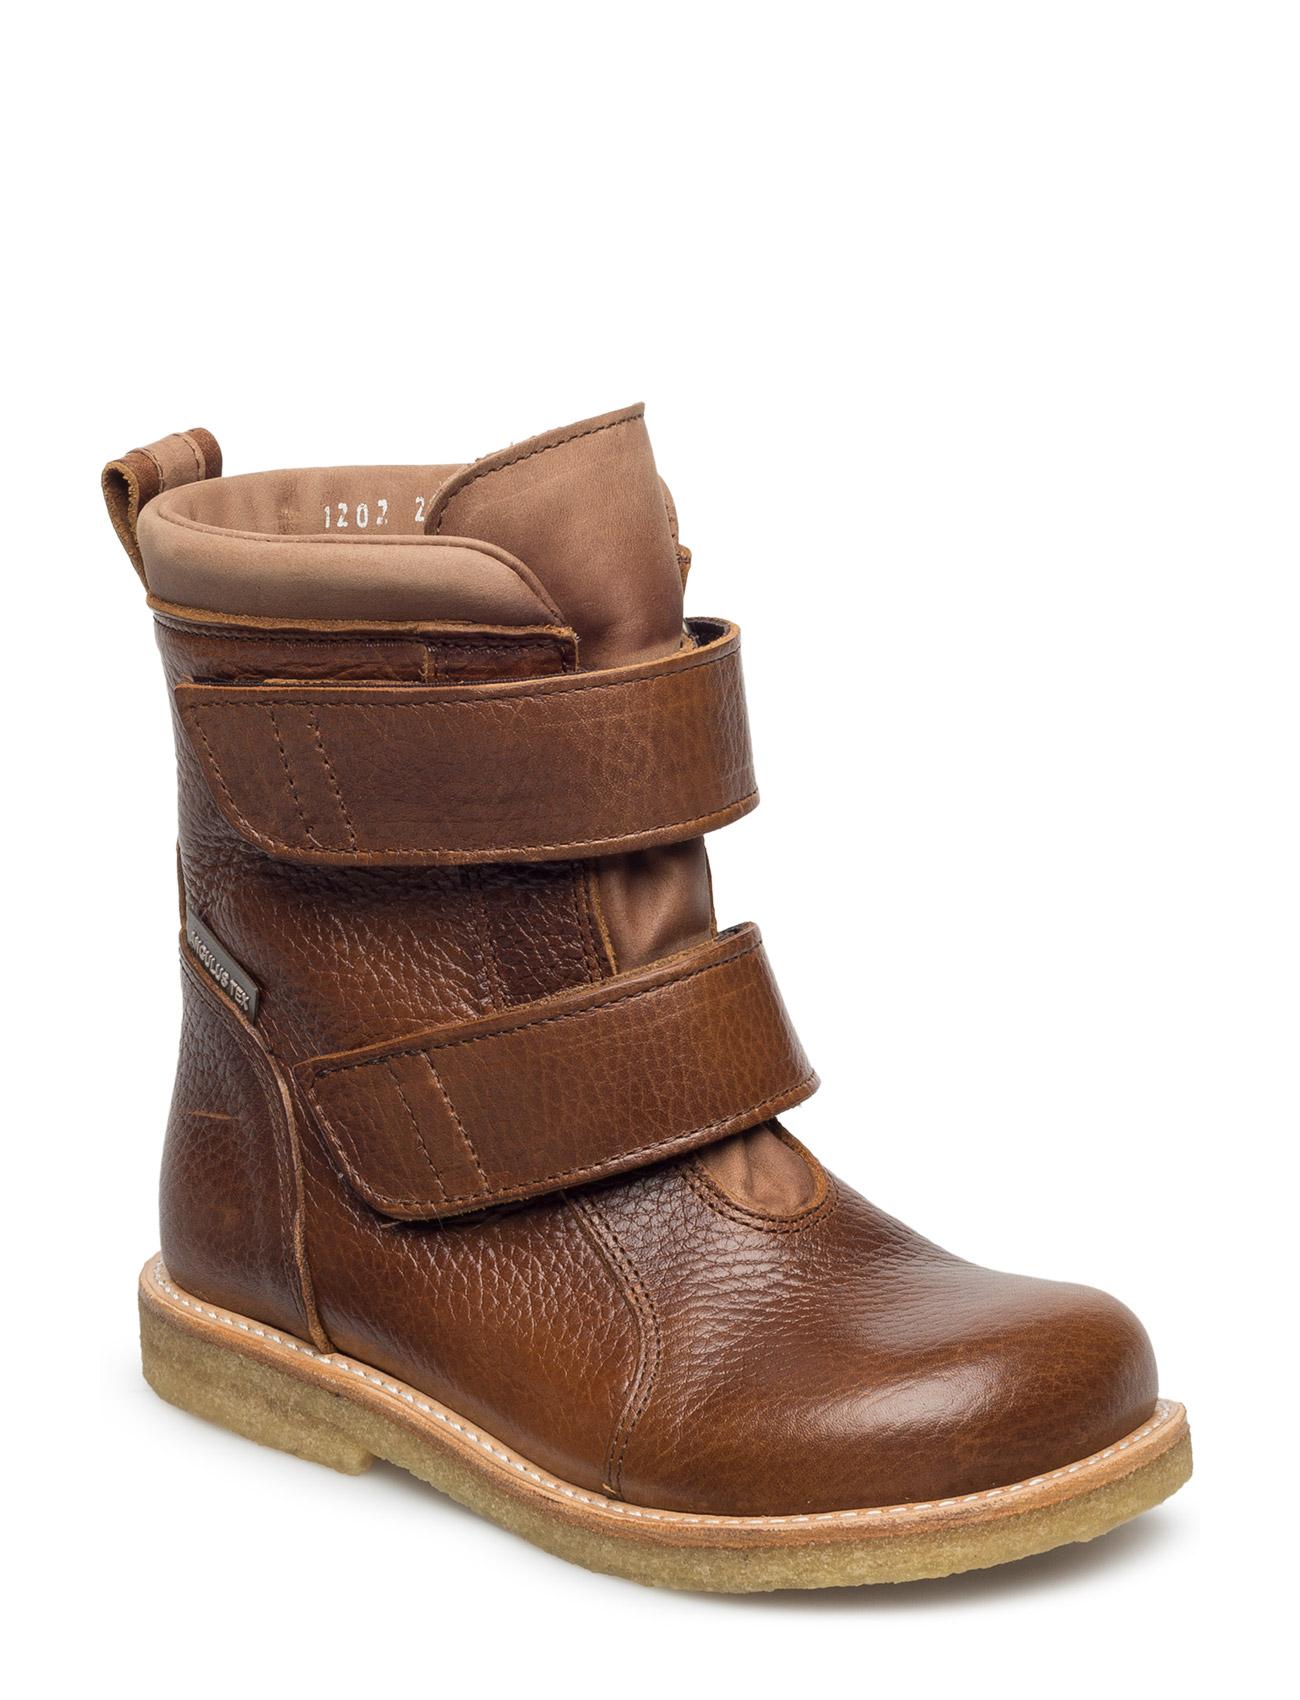 1202 ANGULUS Støvler til Børn i